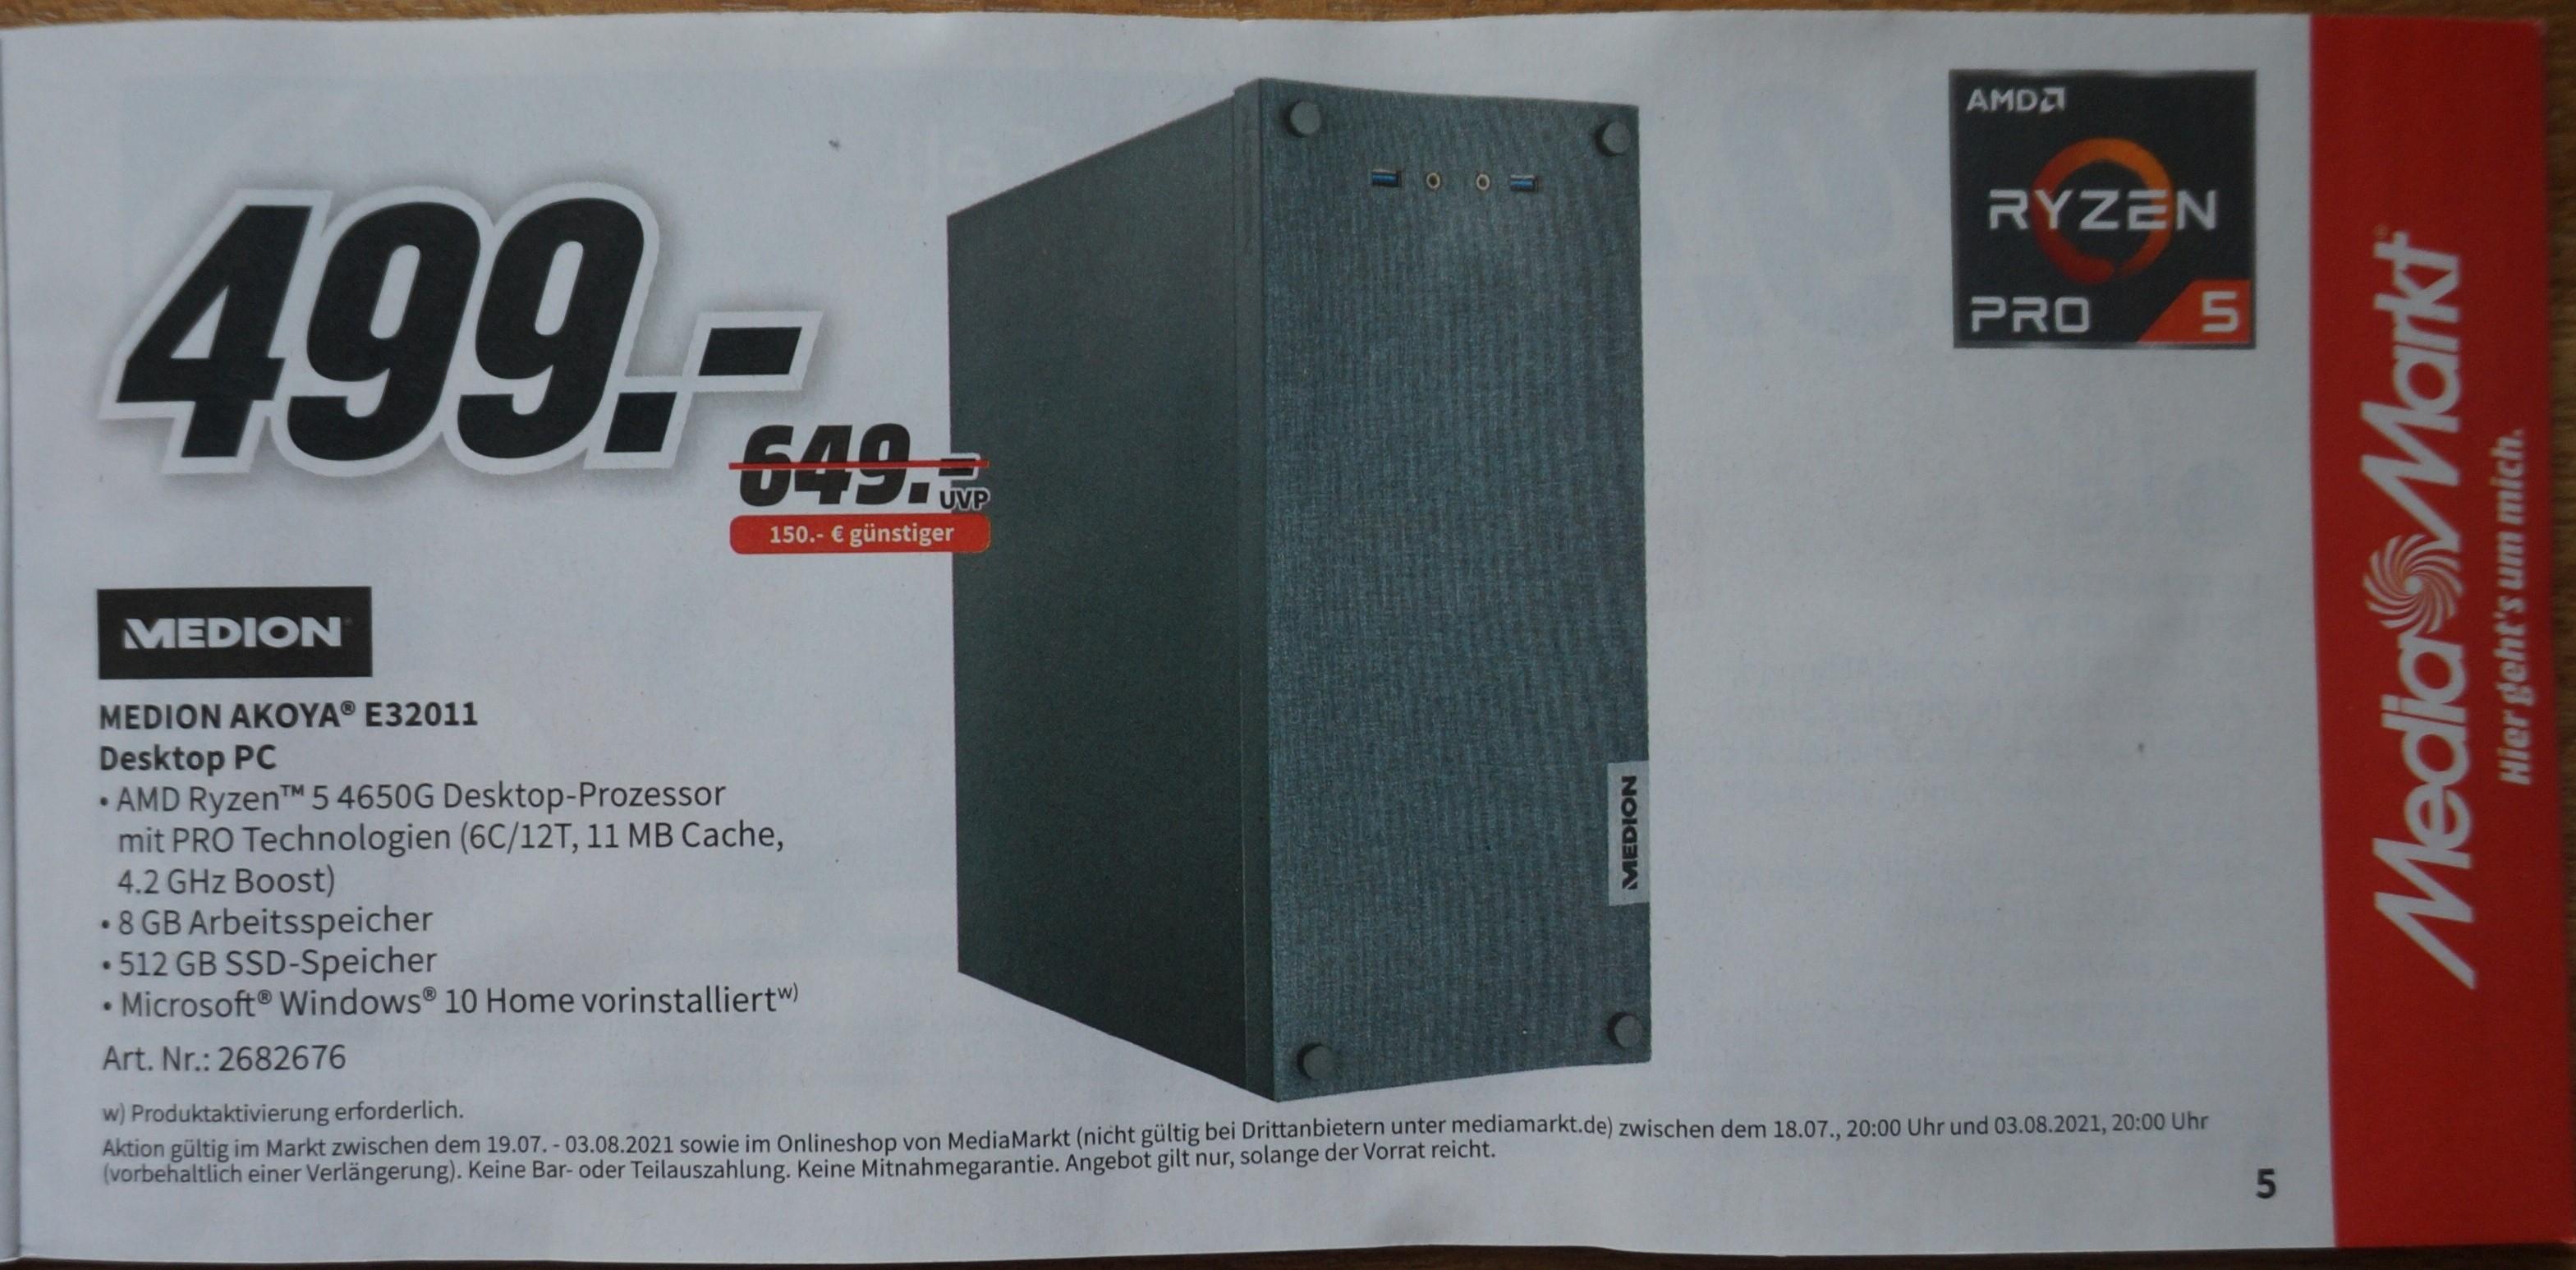 [Media Markt] Gutscheinheft: PC / Notebook gültig 18.07.-03.08.2021 Medion Akoya E32011